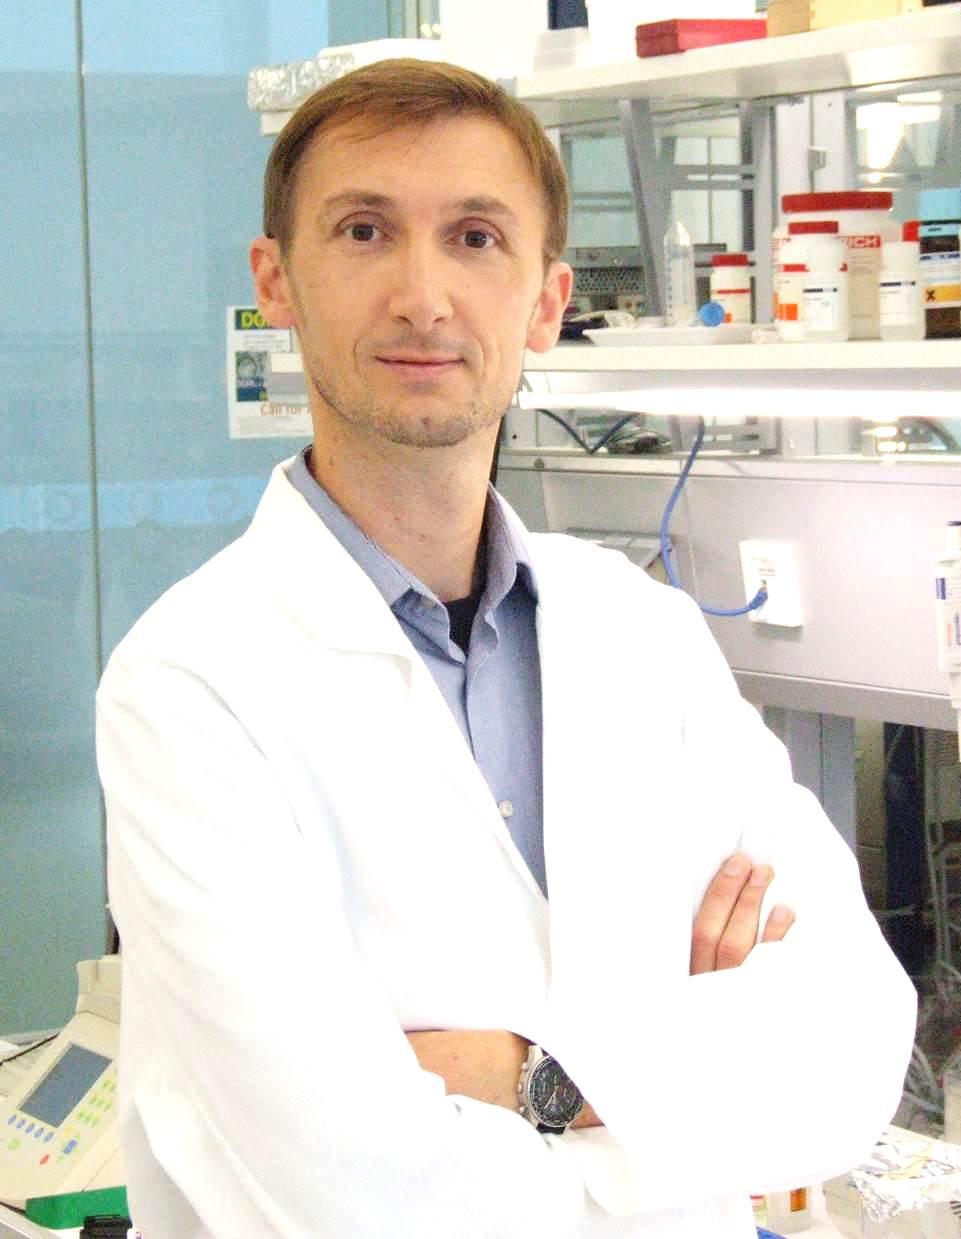 Dr. Ronny Hänold